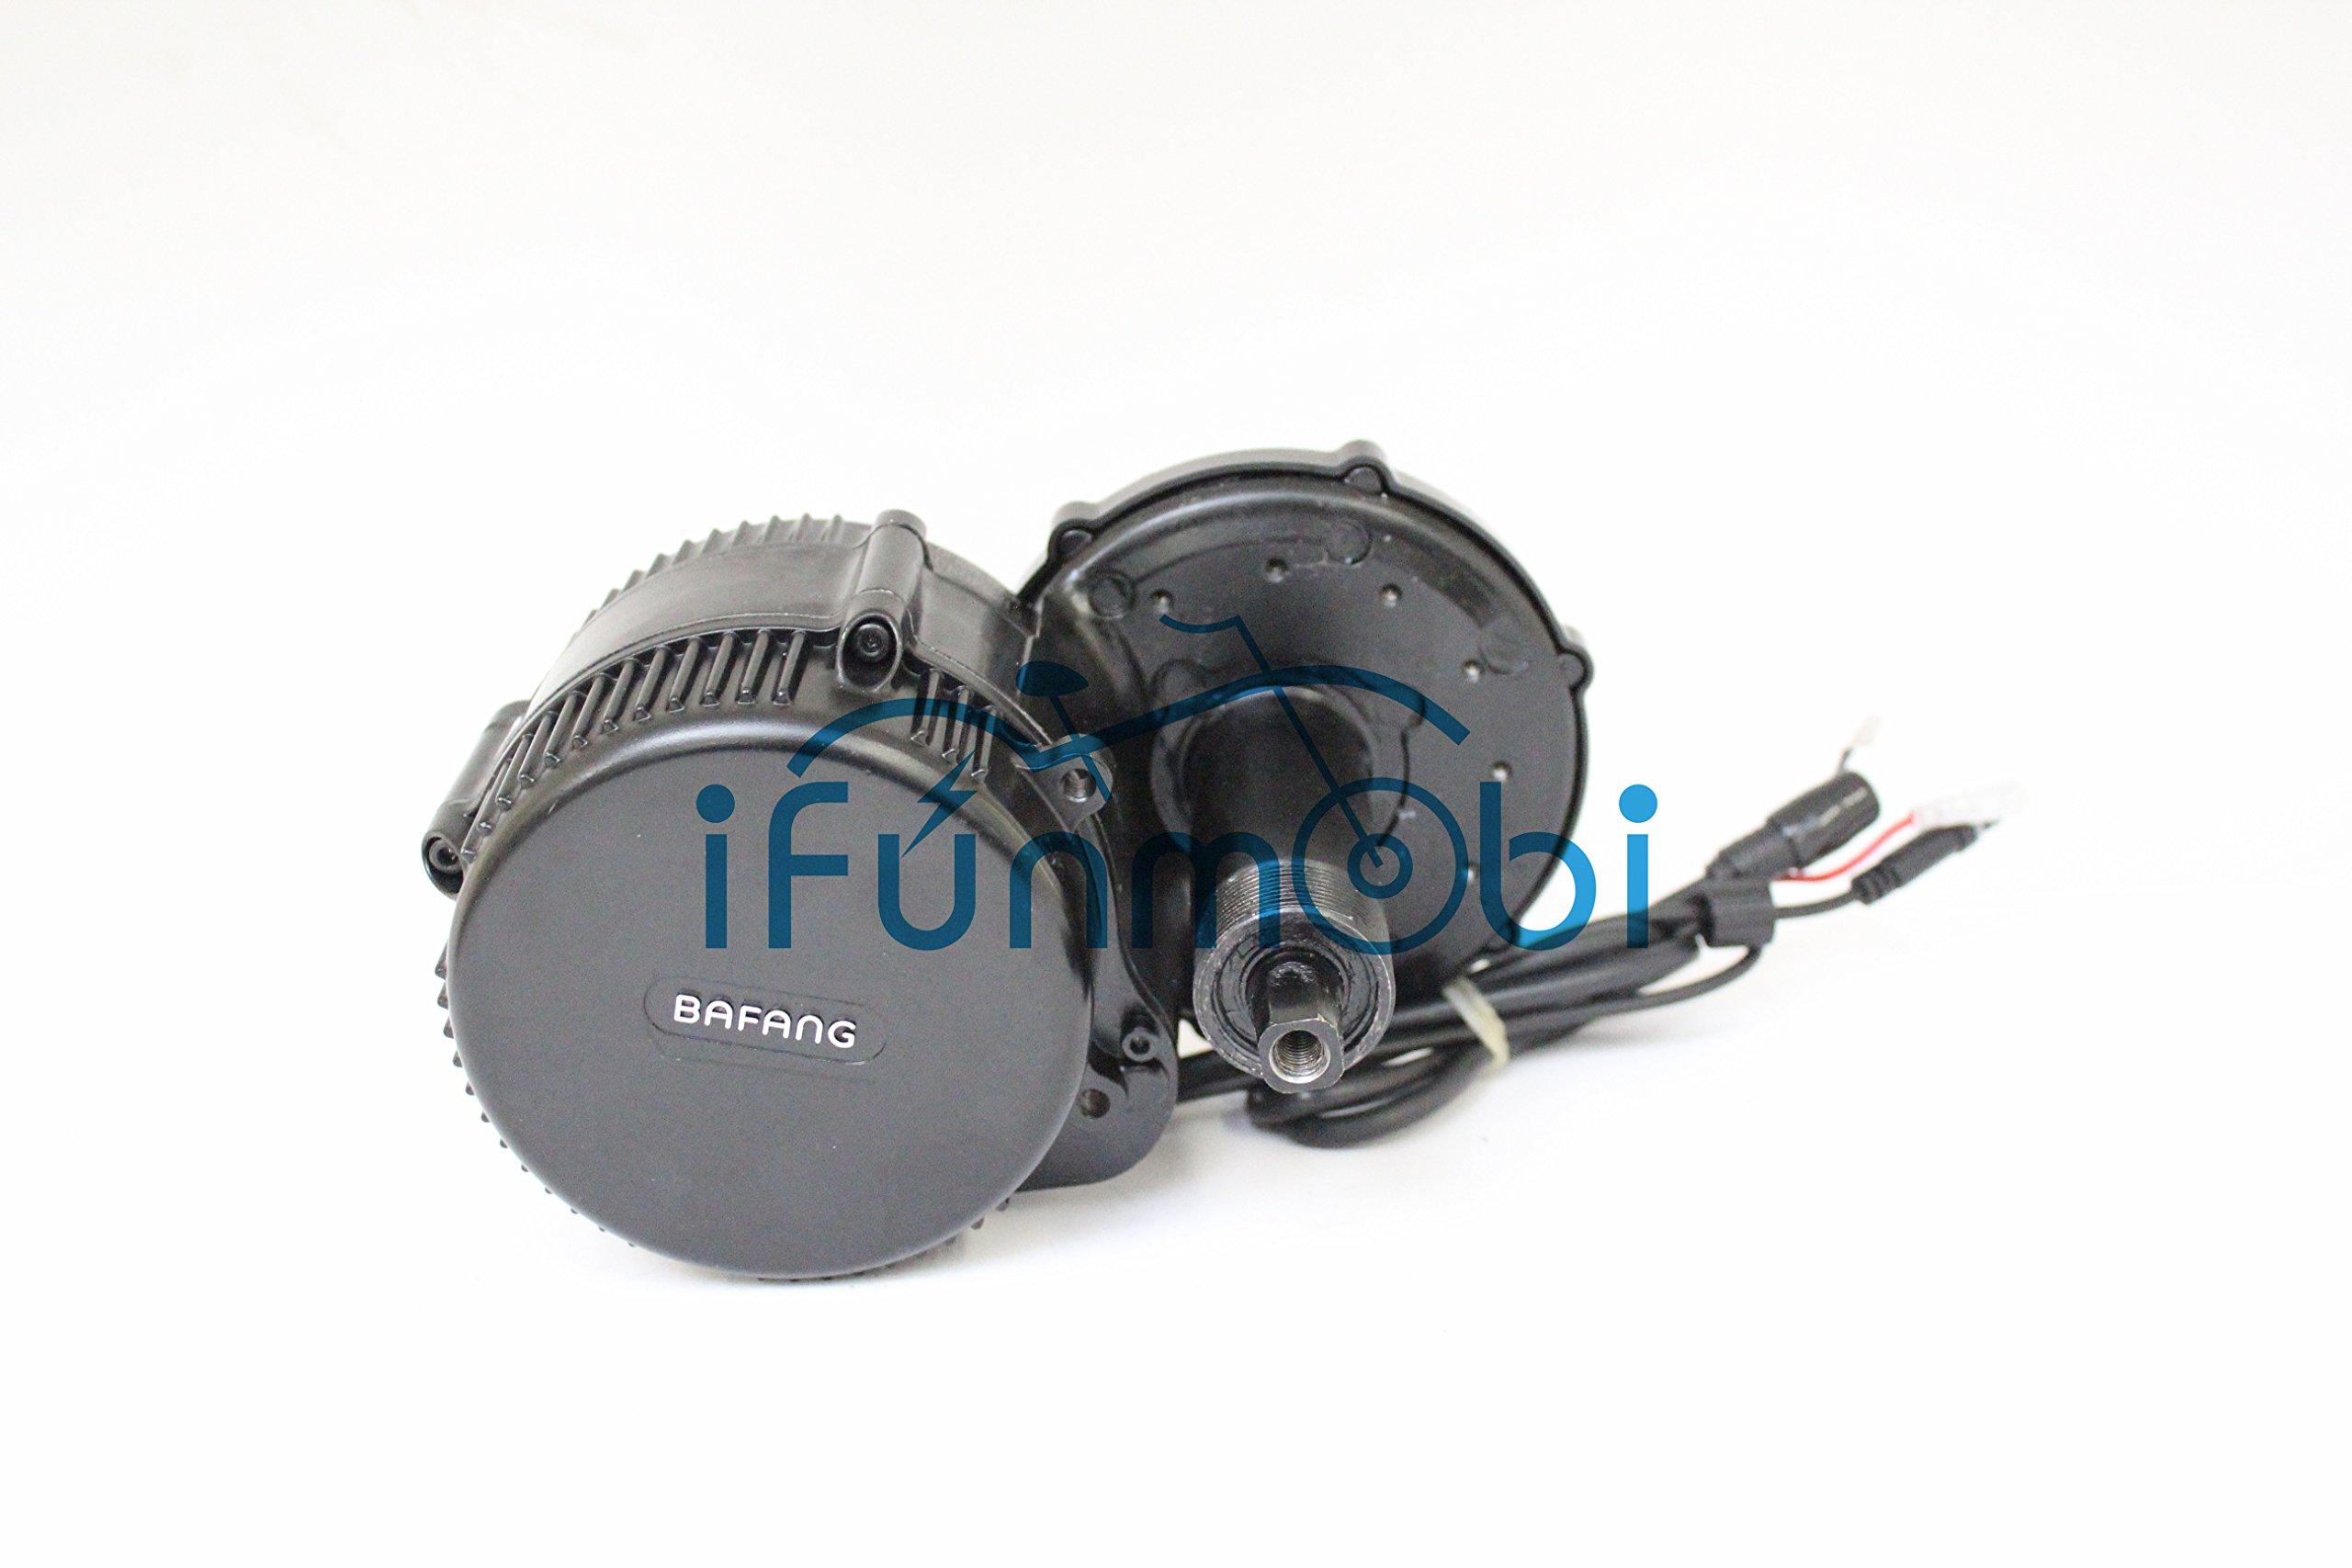 81KKadaLLIL - 48V 750W Bafang 8fun Mid Crank Drive Motor Conversion Kits + 48V 14.5AH Down Tube TigerShark Frame CasePanasonic Cell…